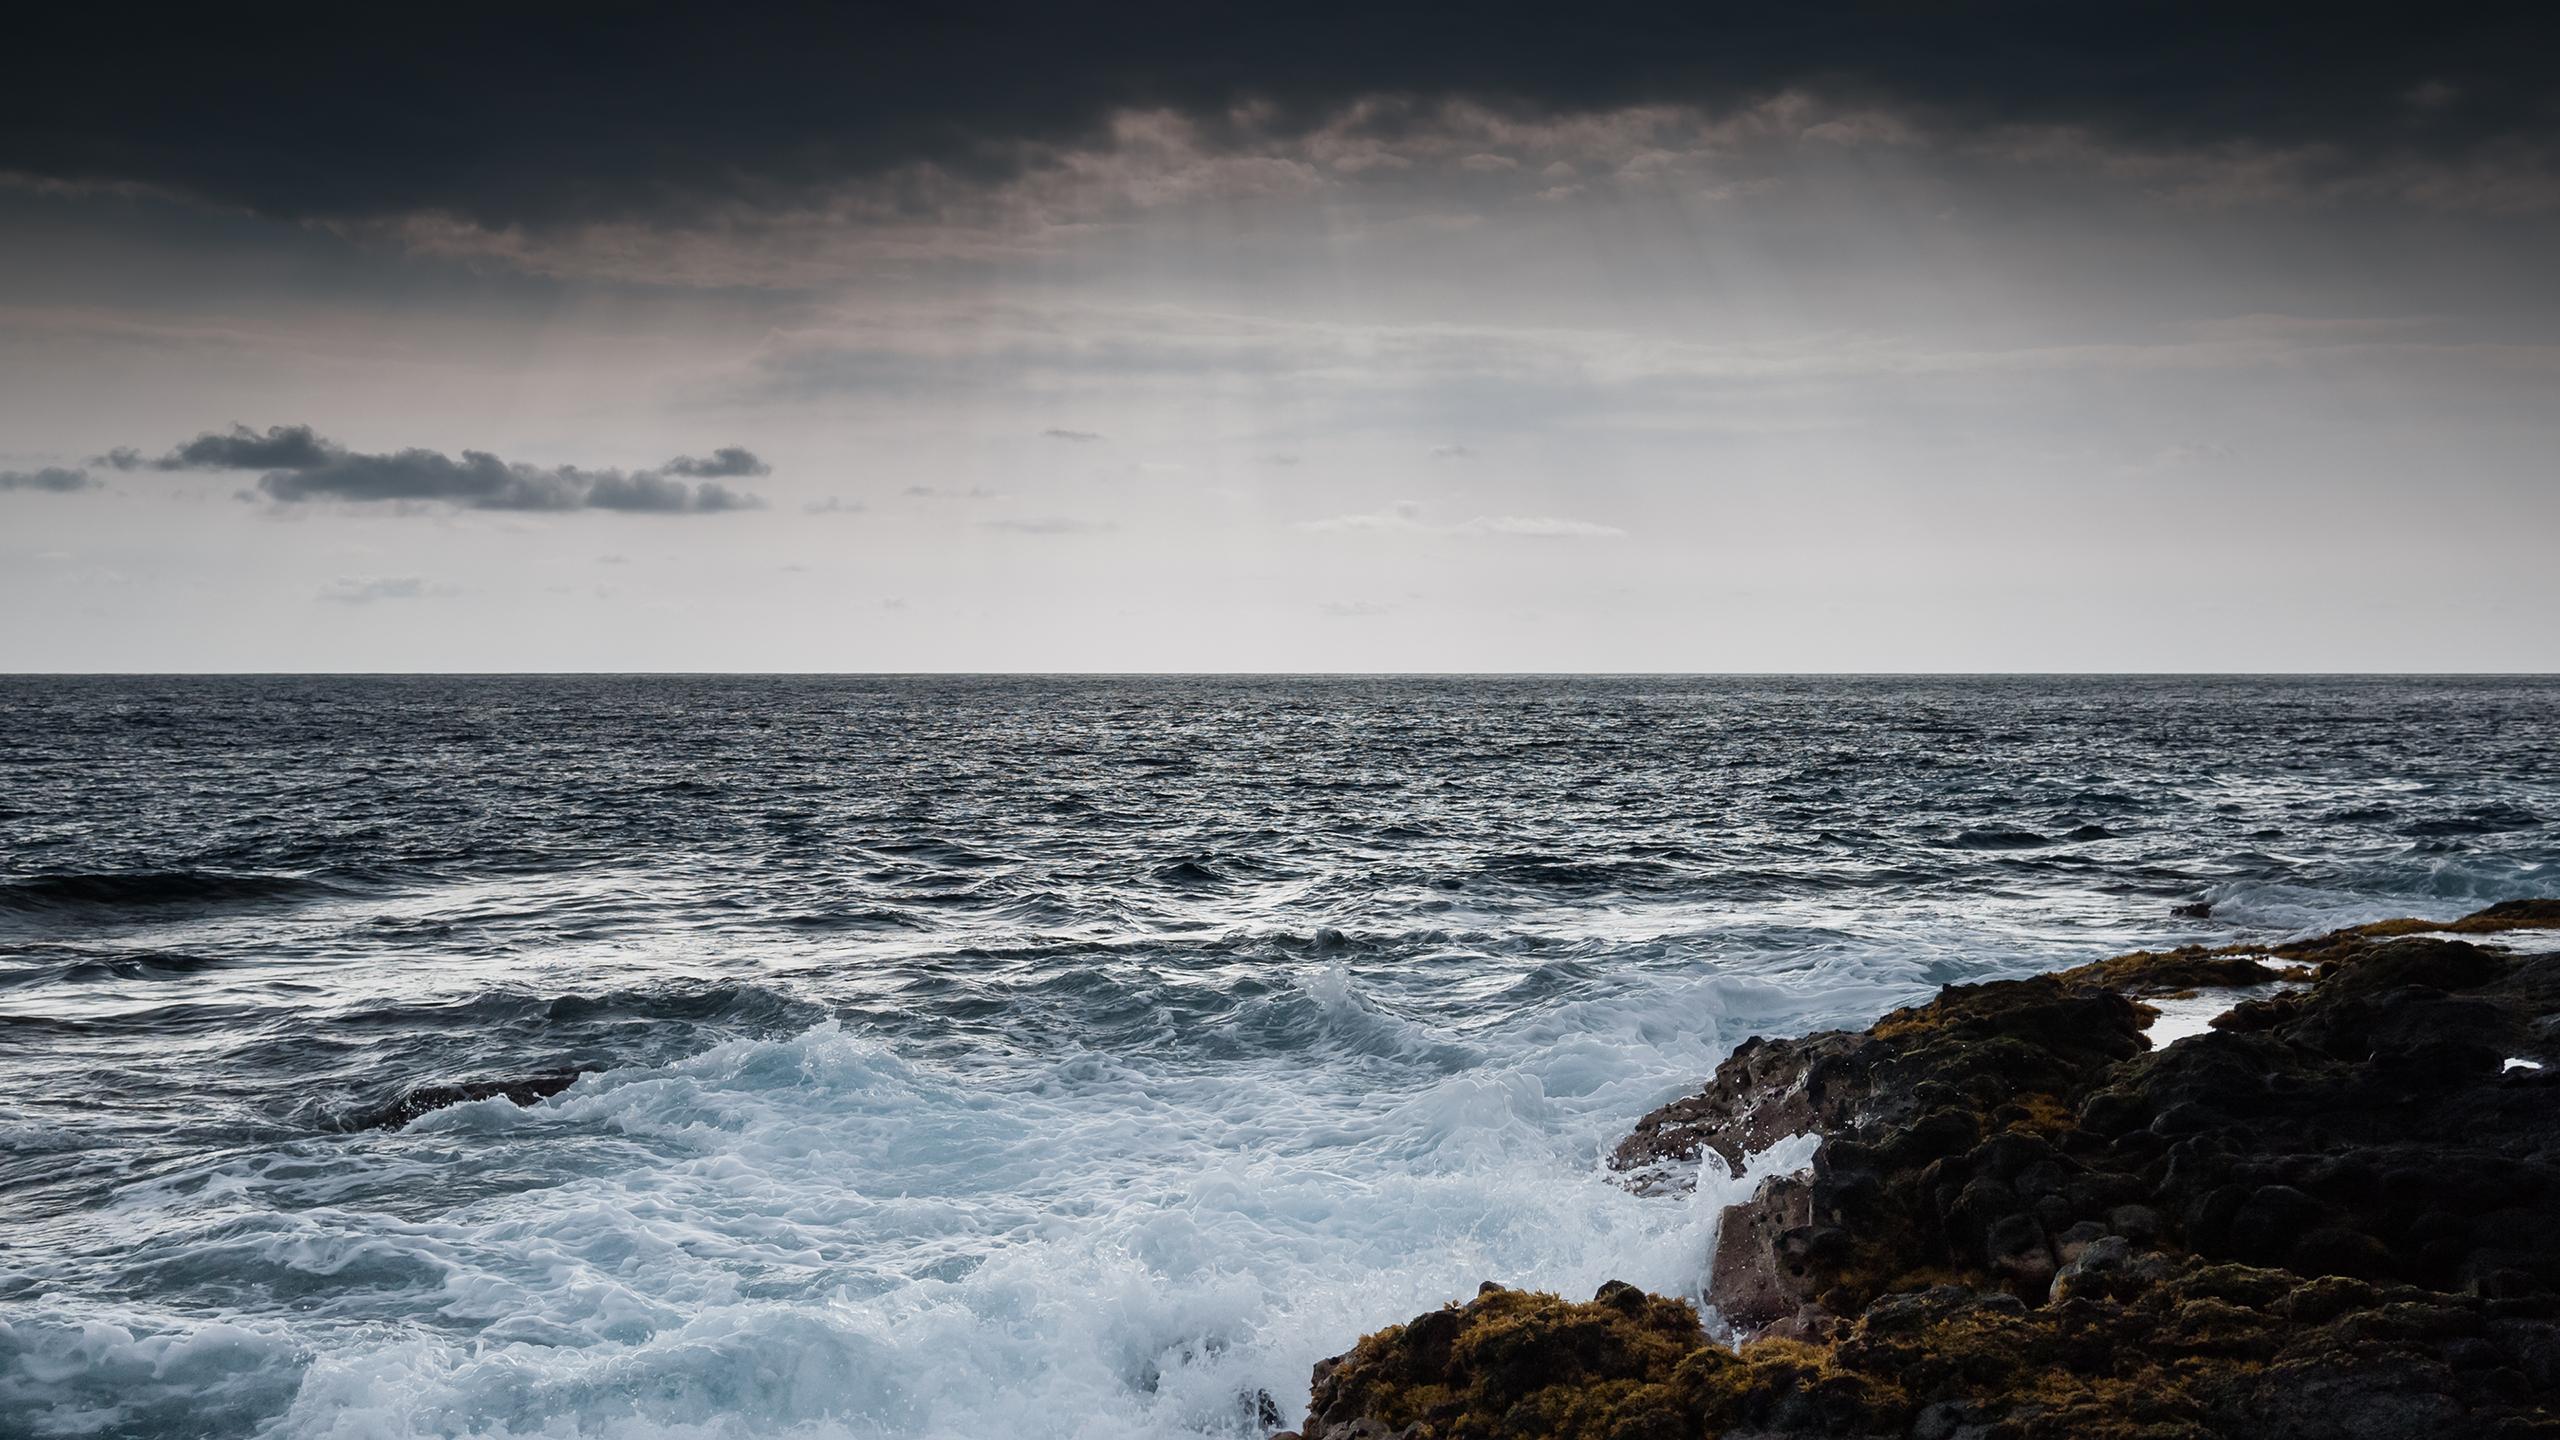 stormy_sea_wallpaper_2560x1440